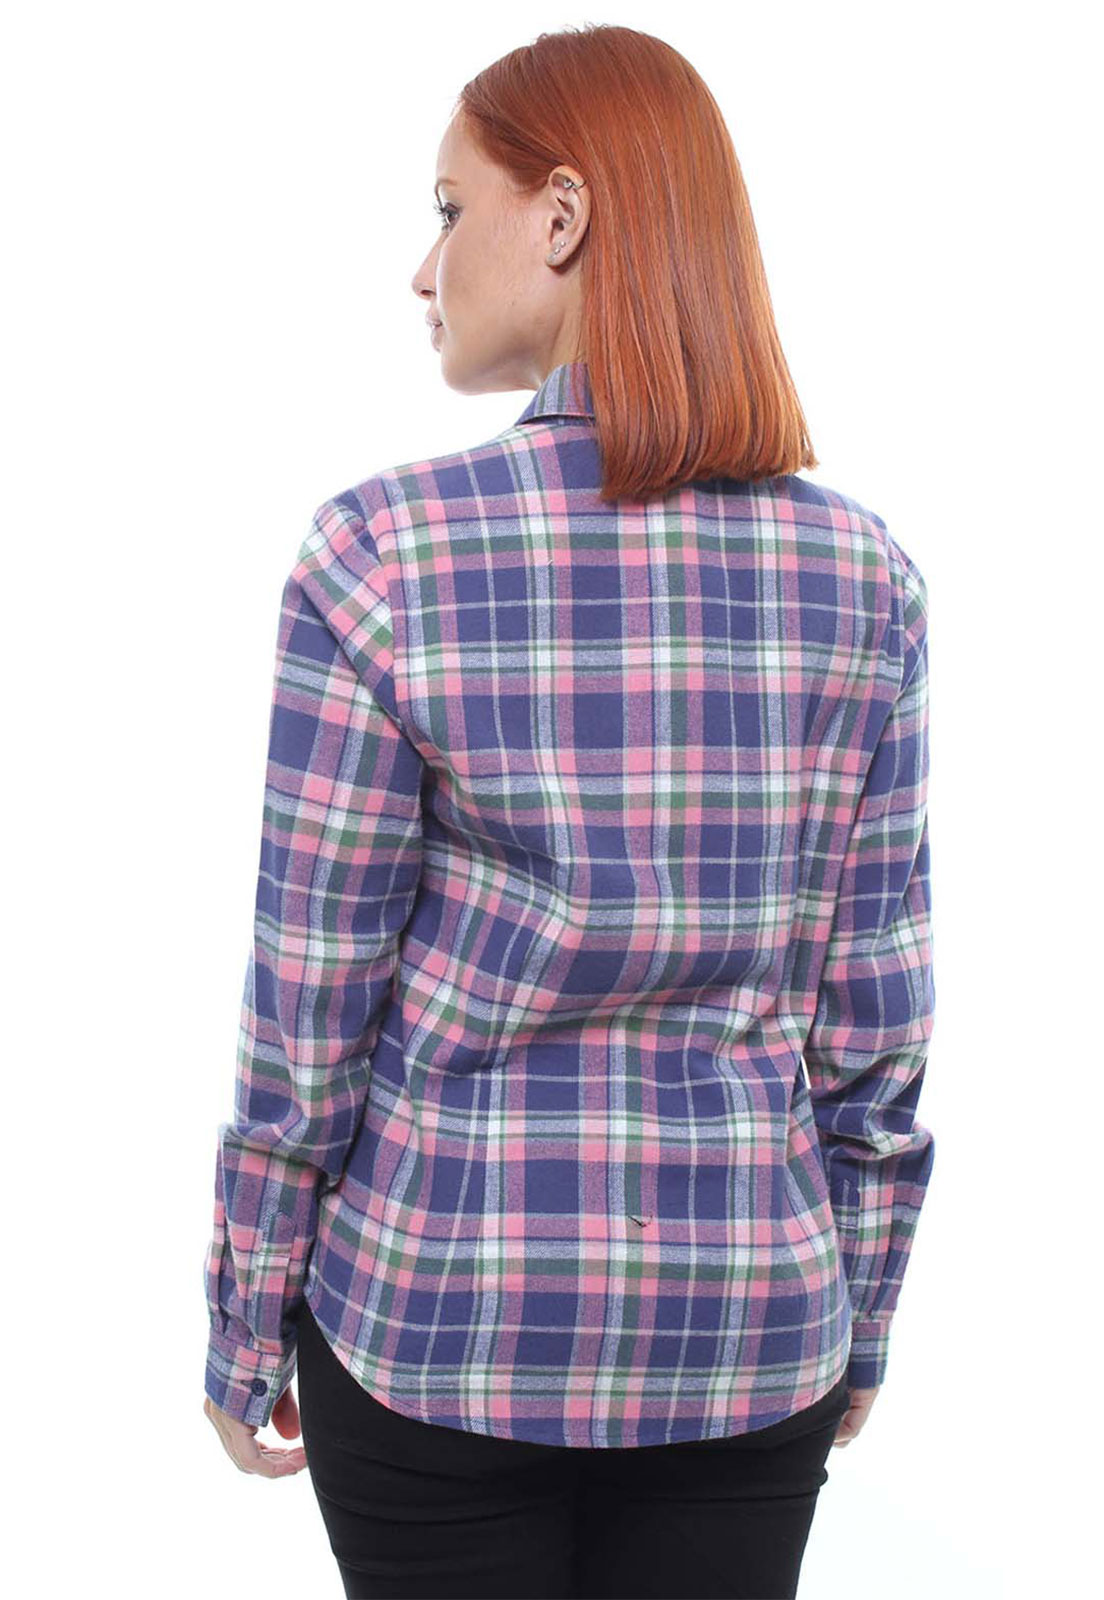 Camisa Feminina Xadrez Flanelada Crocker - 47390  - CROCKER JEANS